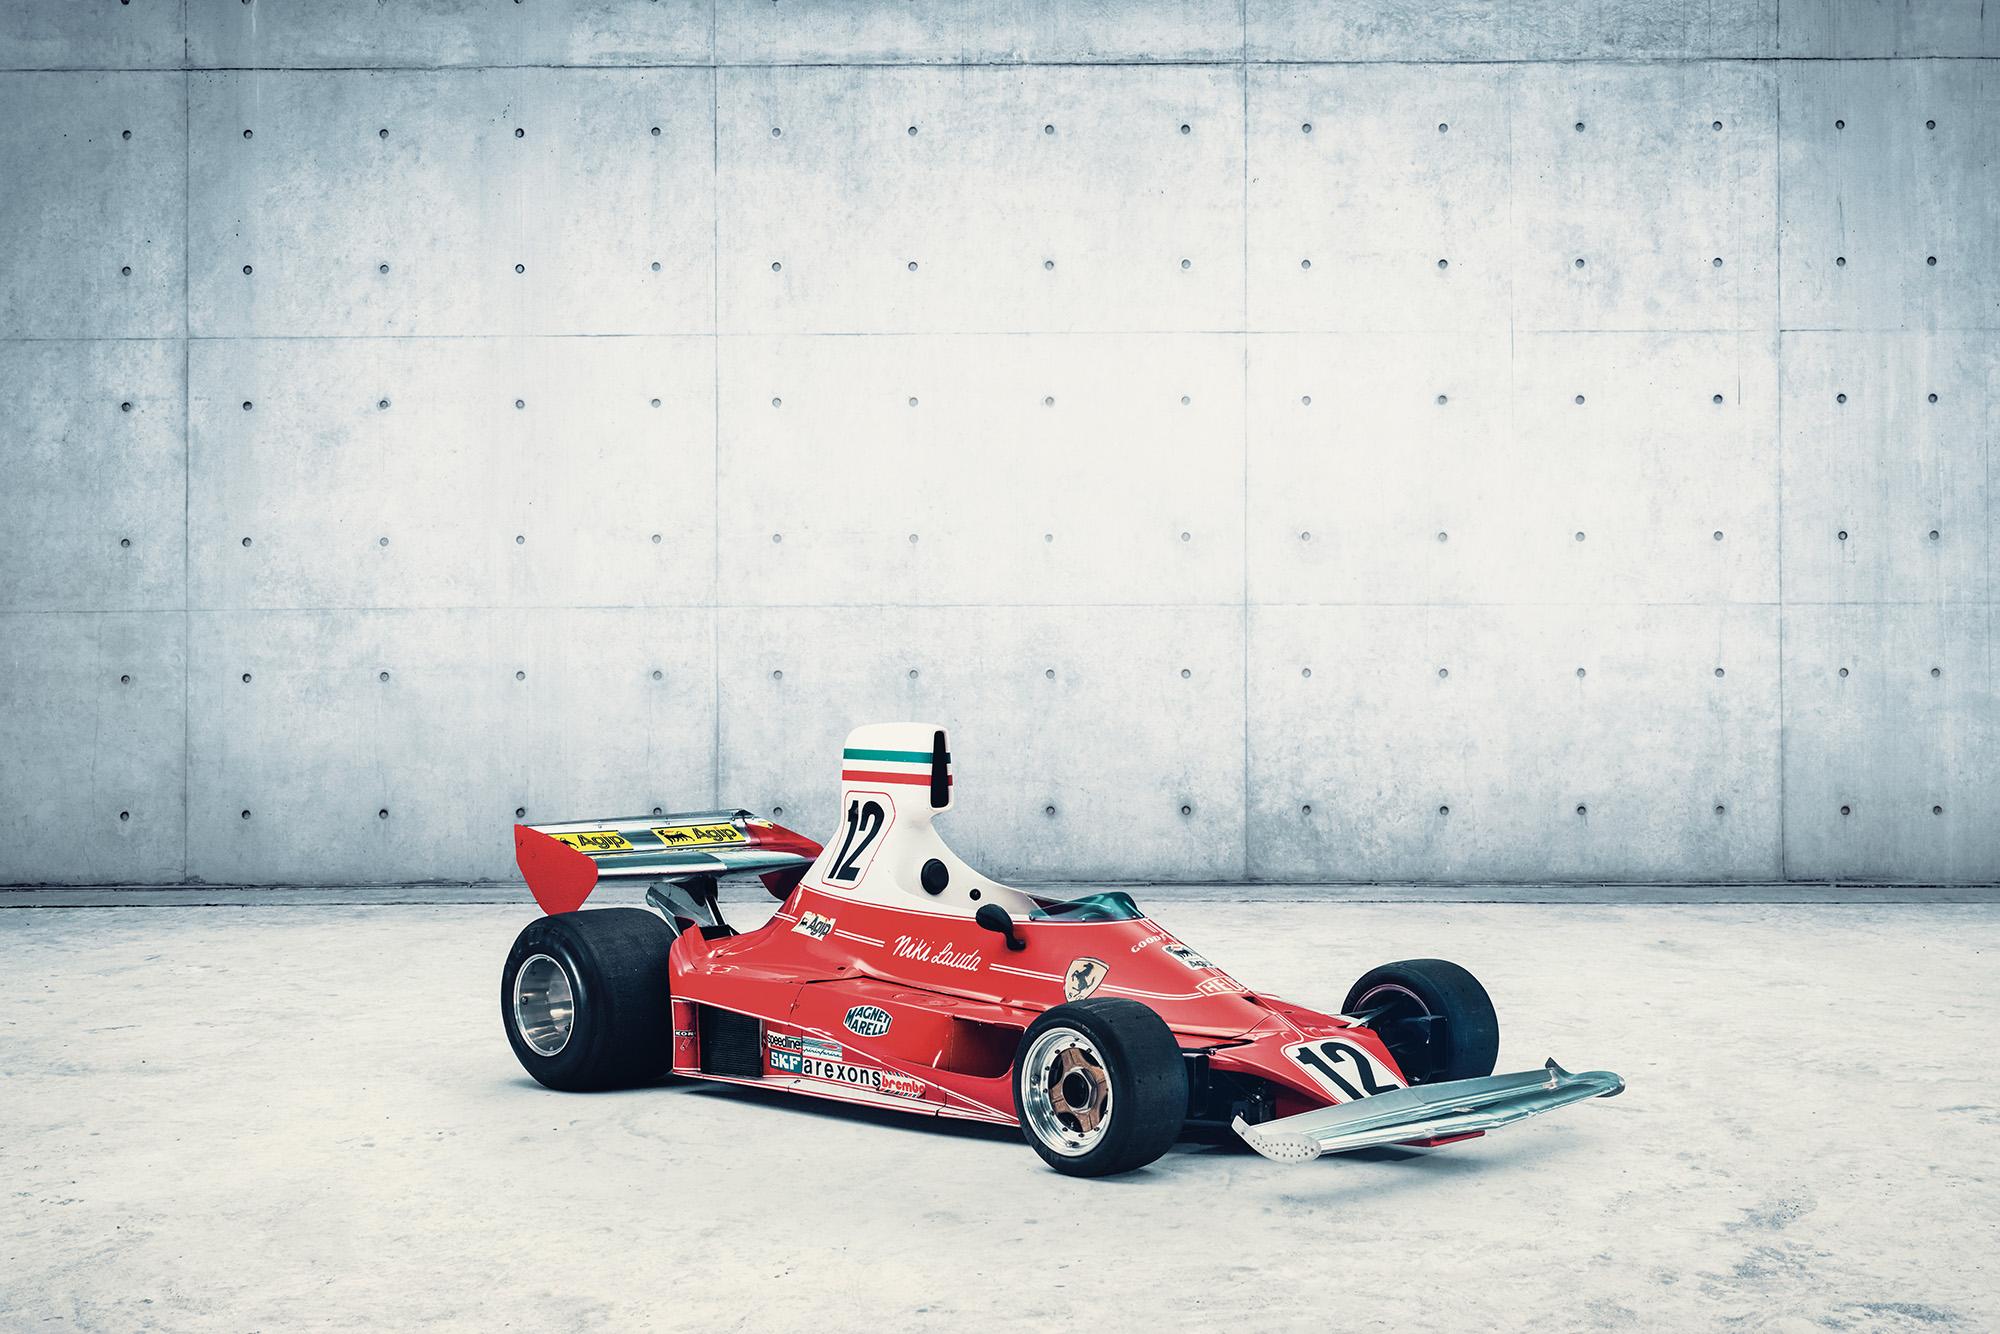 Niki Lauda 1975 Ferrari 312T